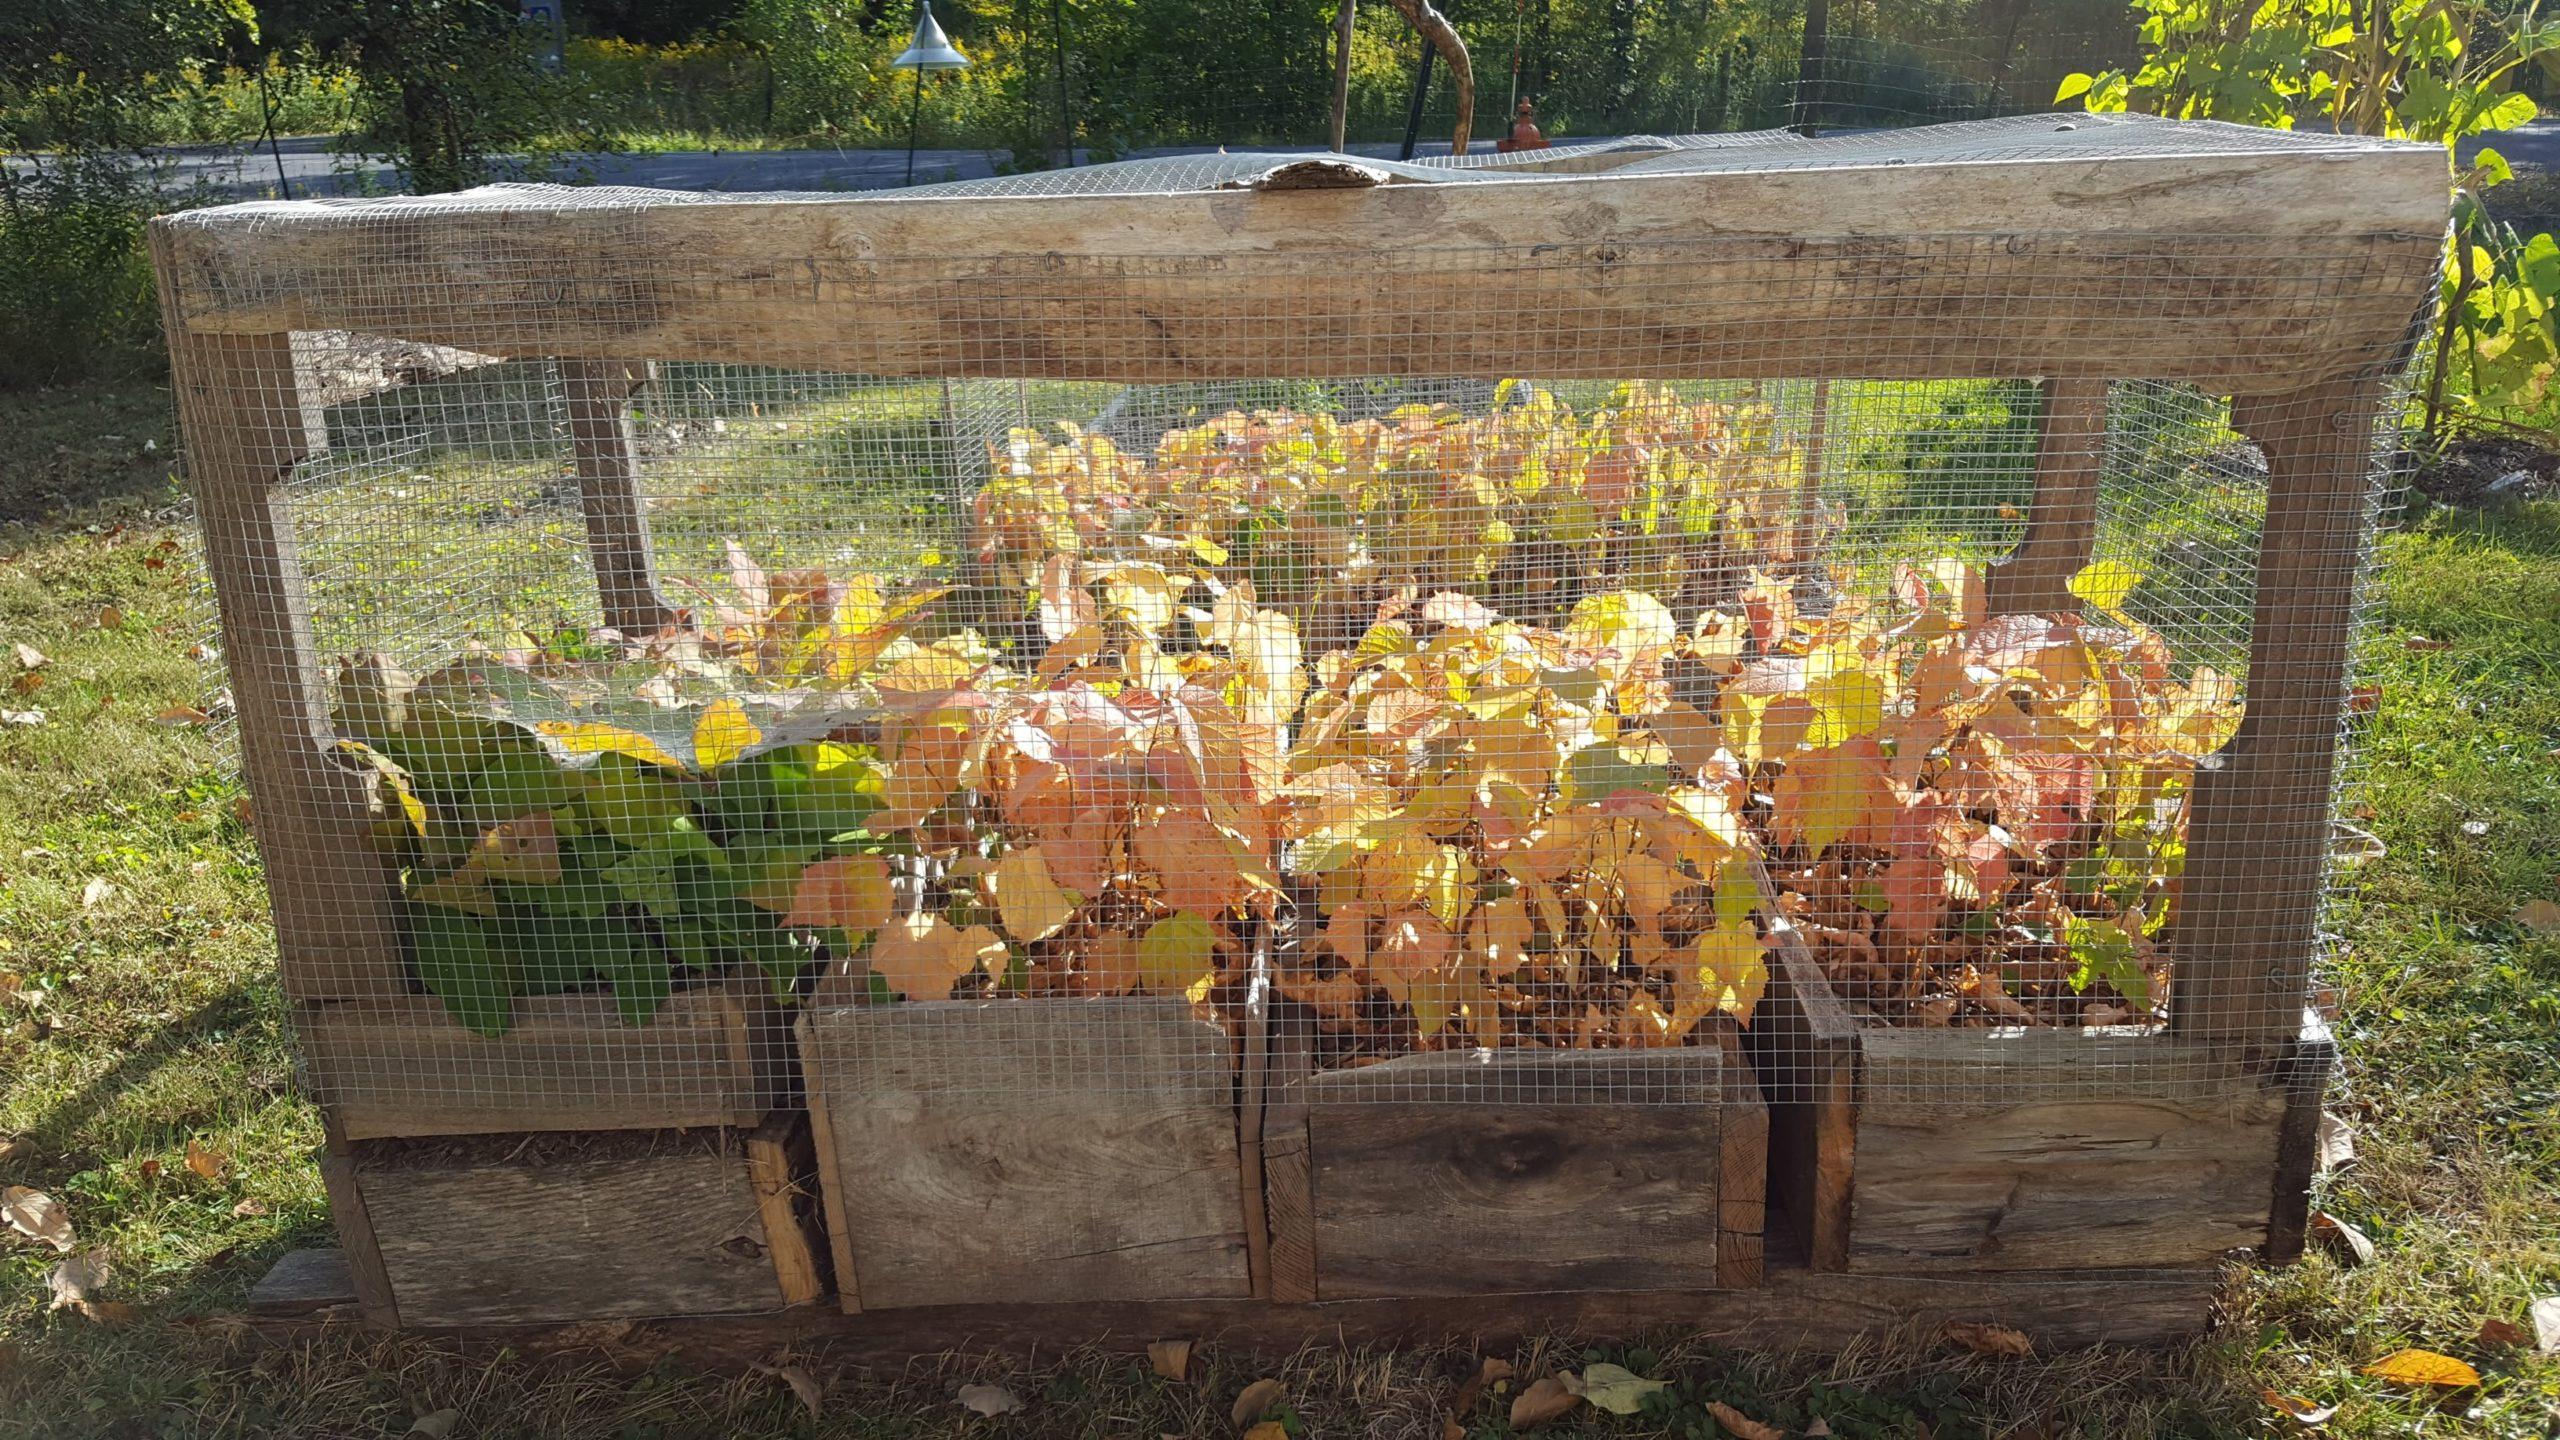 Autumn equinox view of air prune beds growing hazel and red oak seedlings